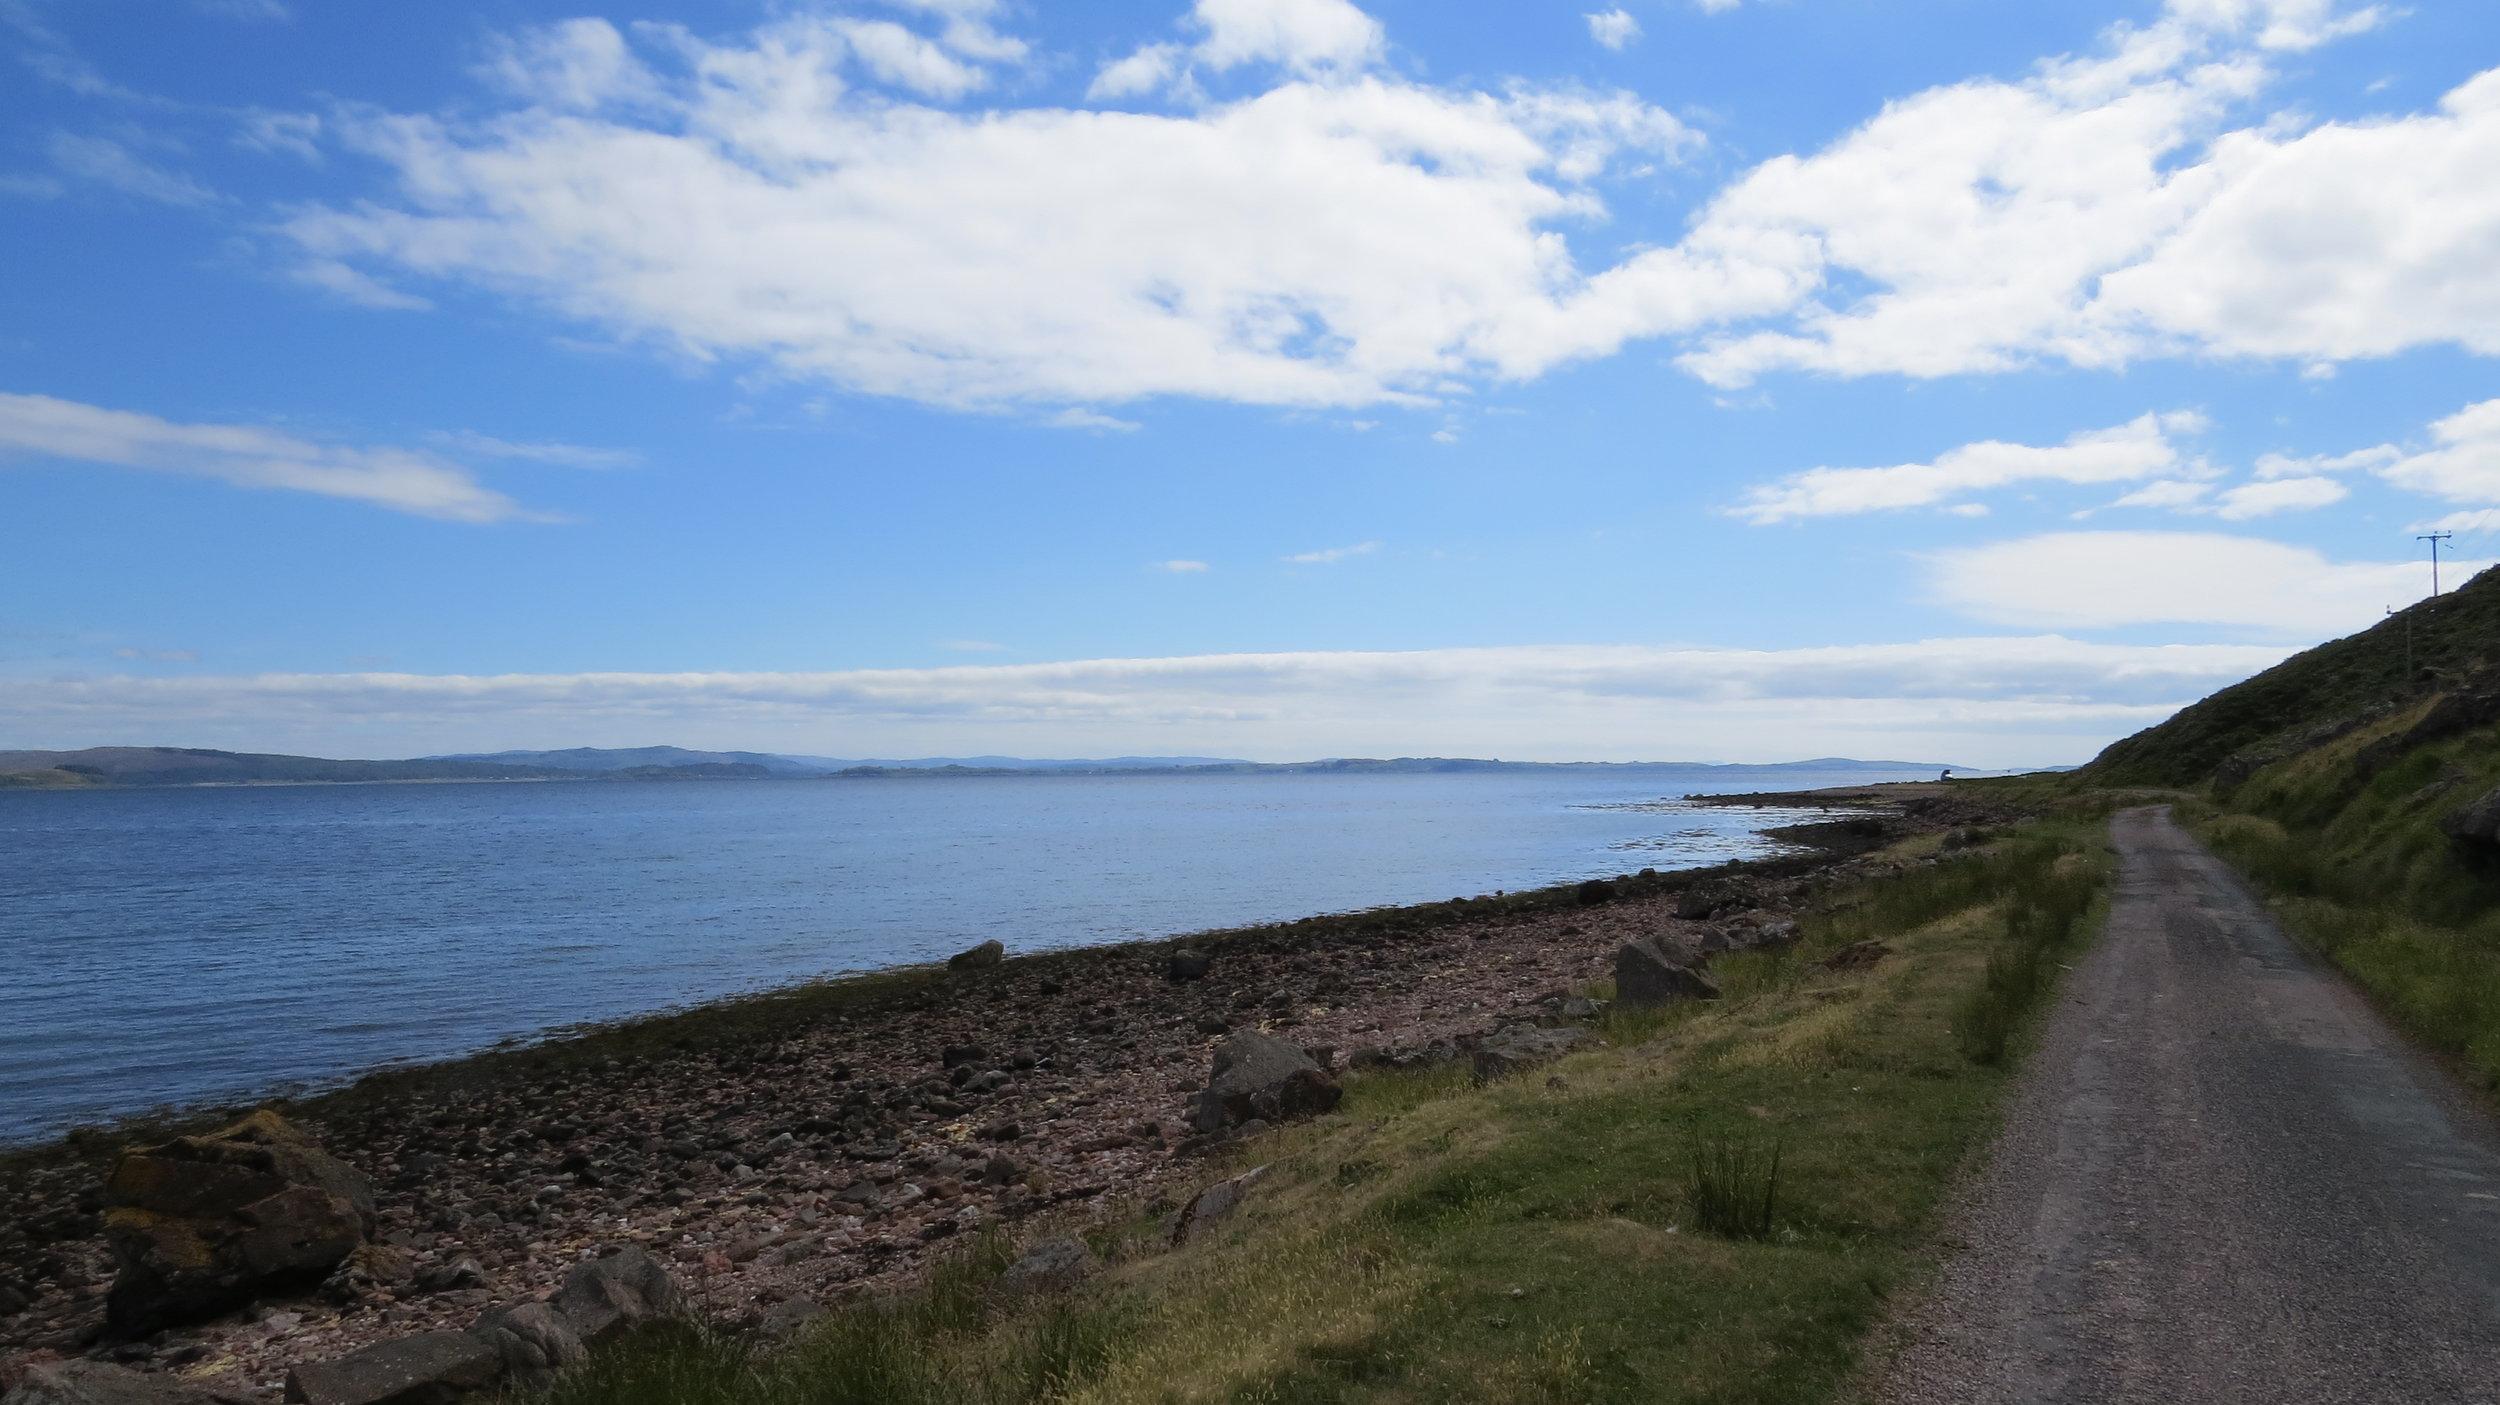 Road to Kingairloch I